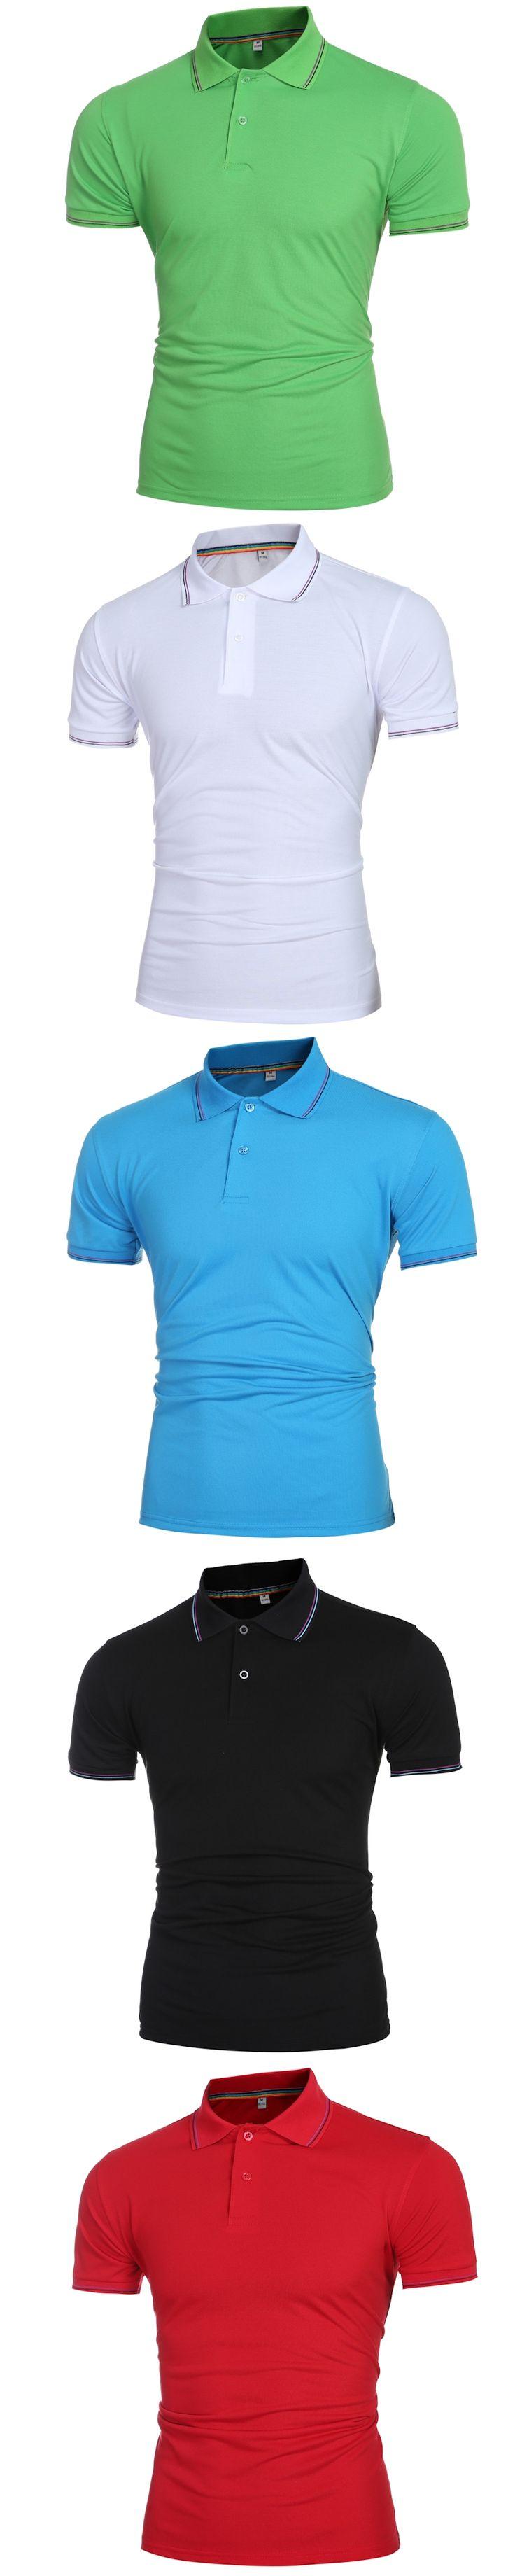 New Arrival 2017 Summer Short Sleeve Shirt Men Brand Polo Shirts For Men Fashion Cotton Brand jerseys Fashion Hip Hop Tops Tees